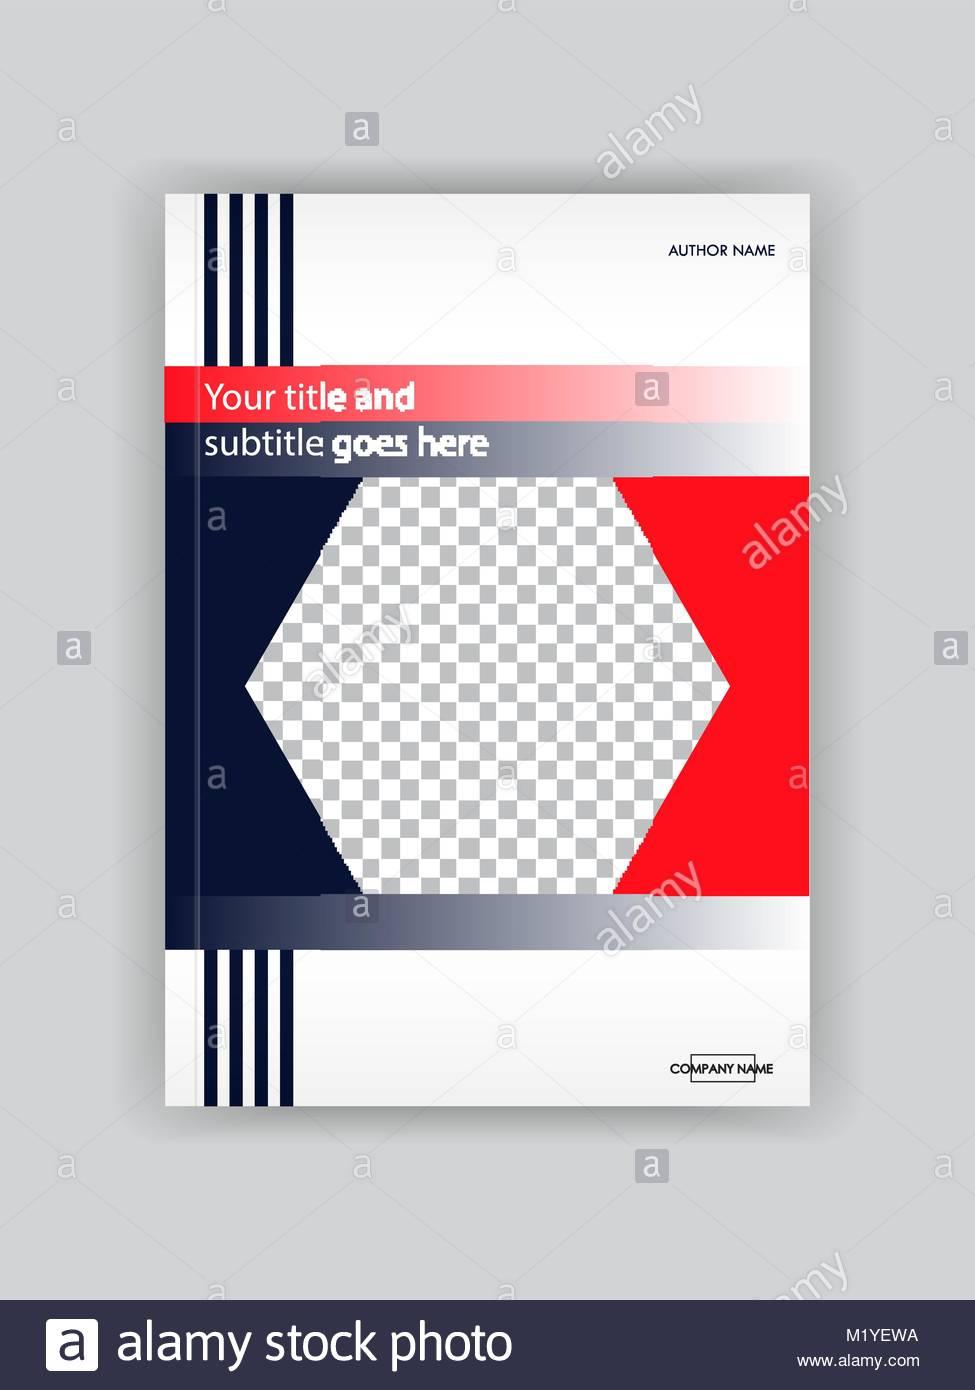 Nice Book Cover Design : Academic journal stock photos